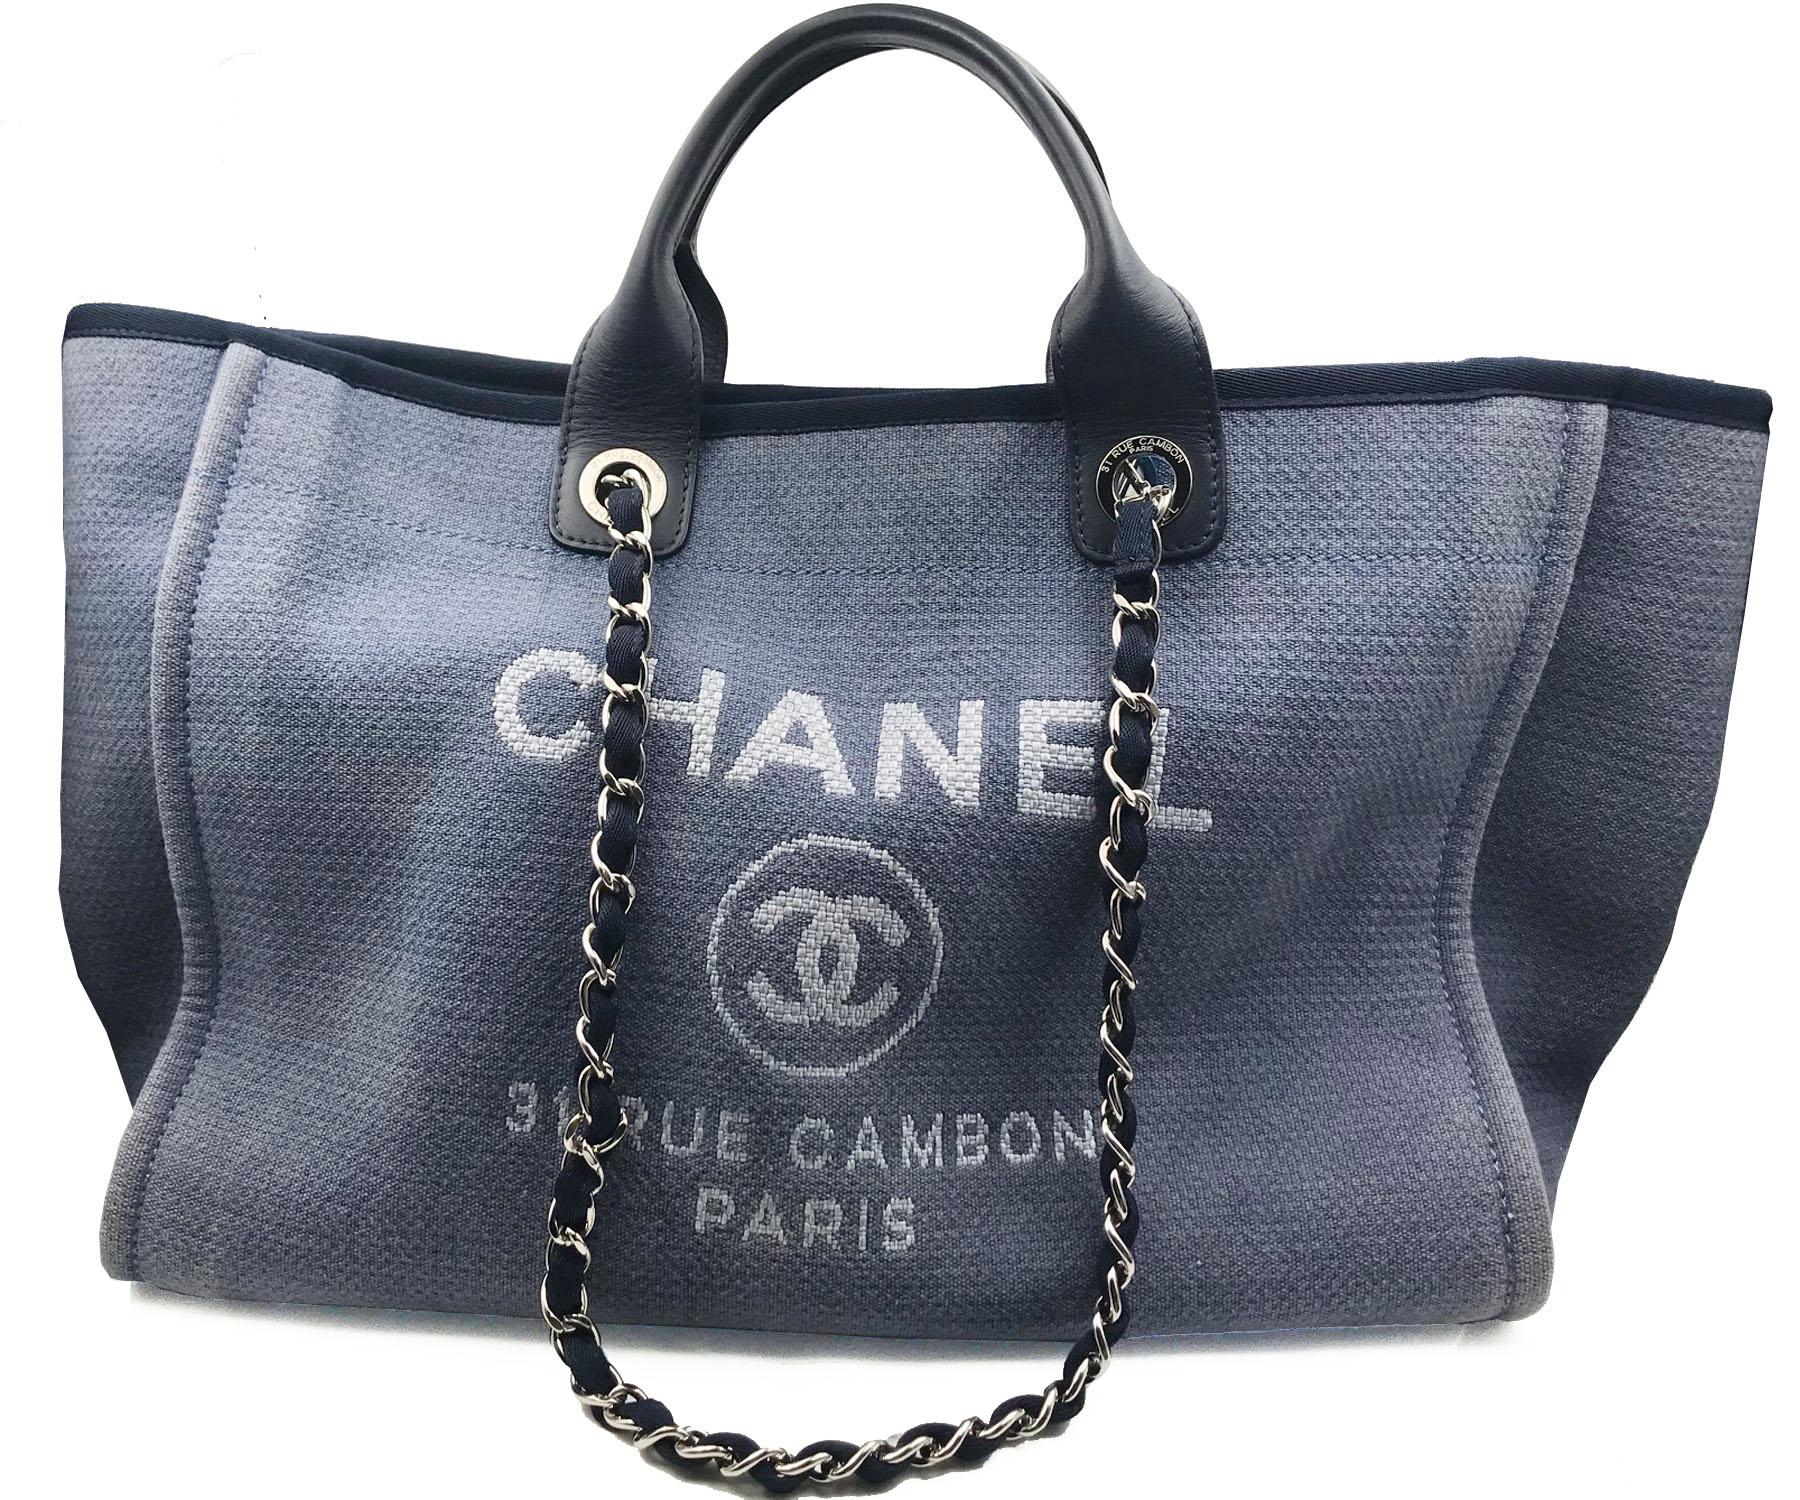 Chanel Blue Cloth Deauville Large Tote Bag Lar Vintage